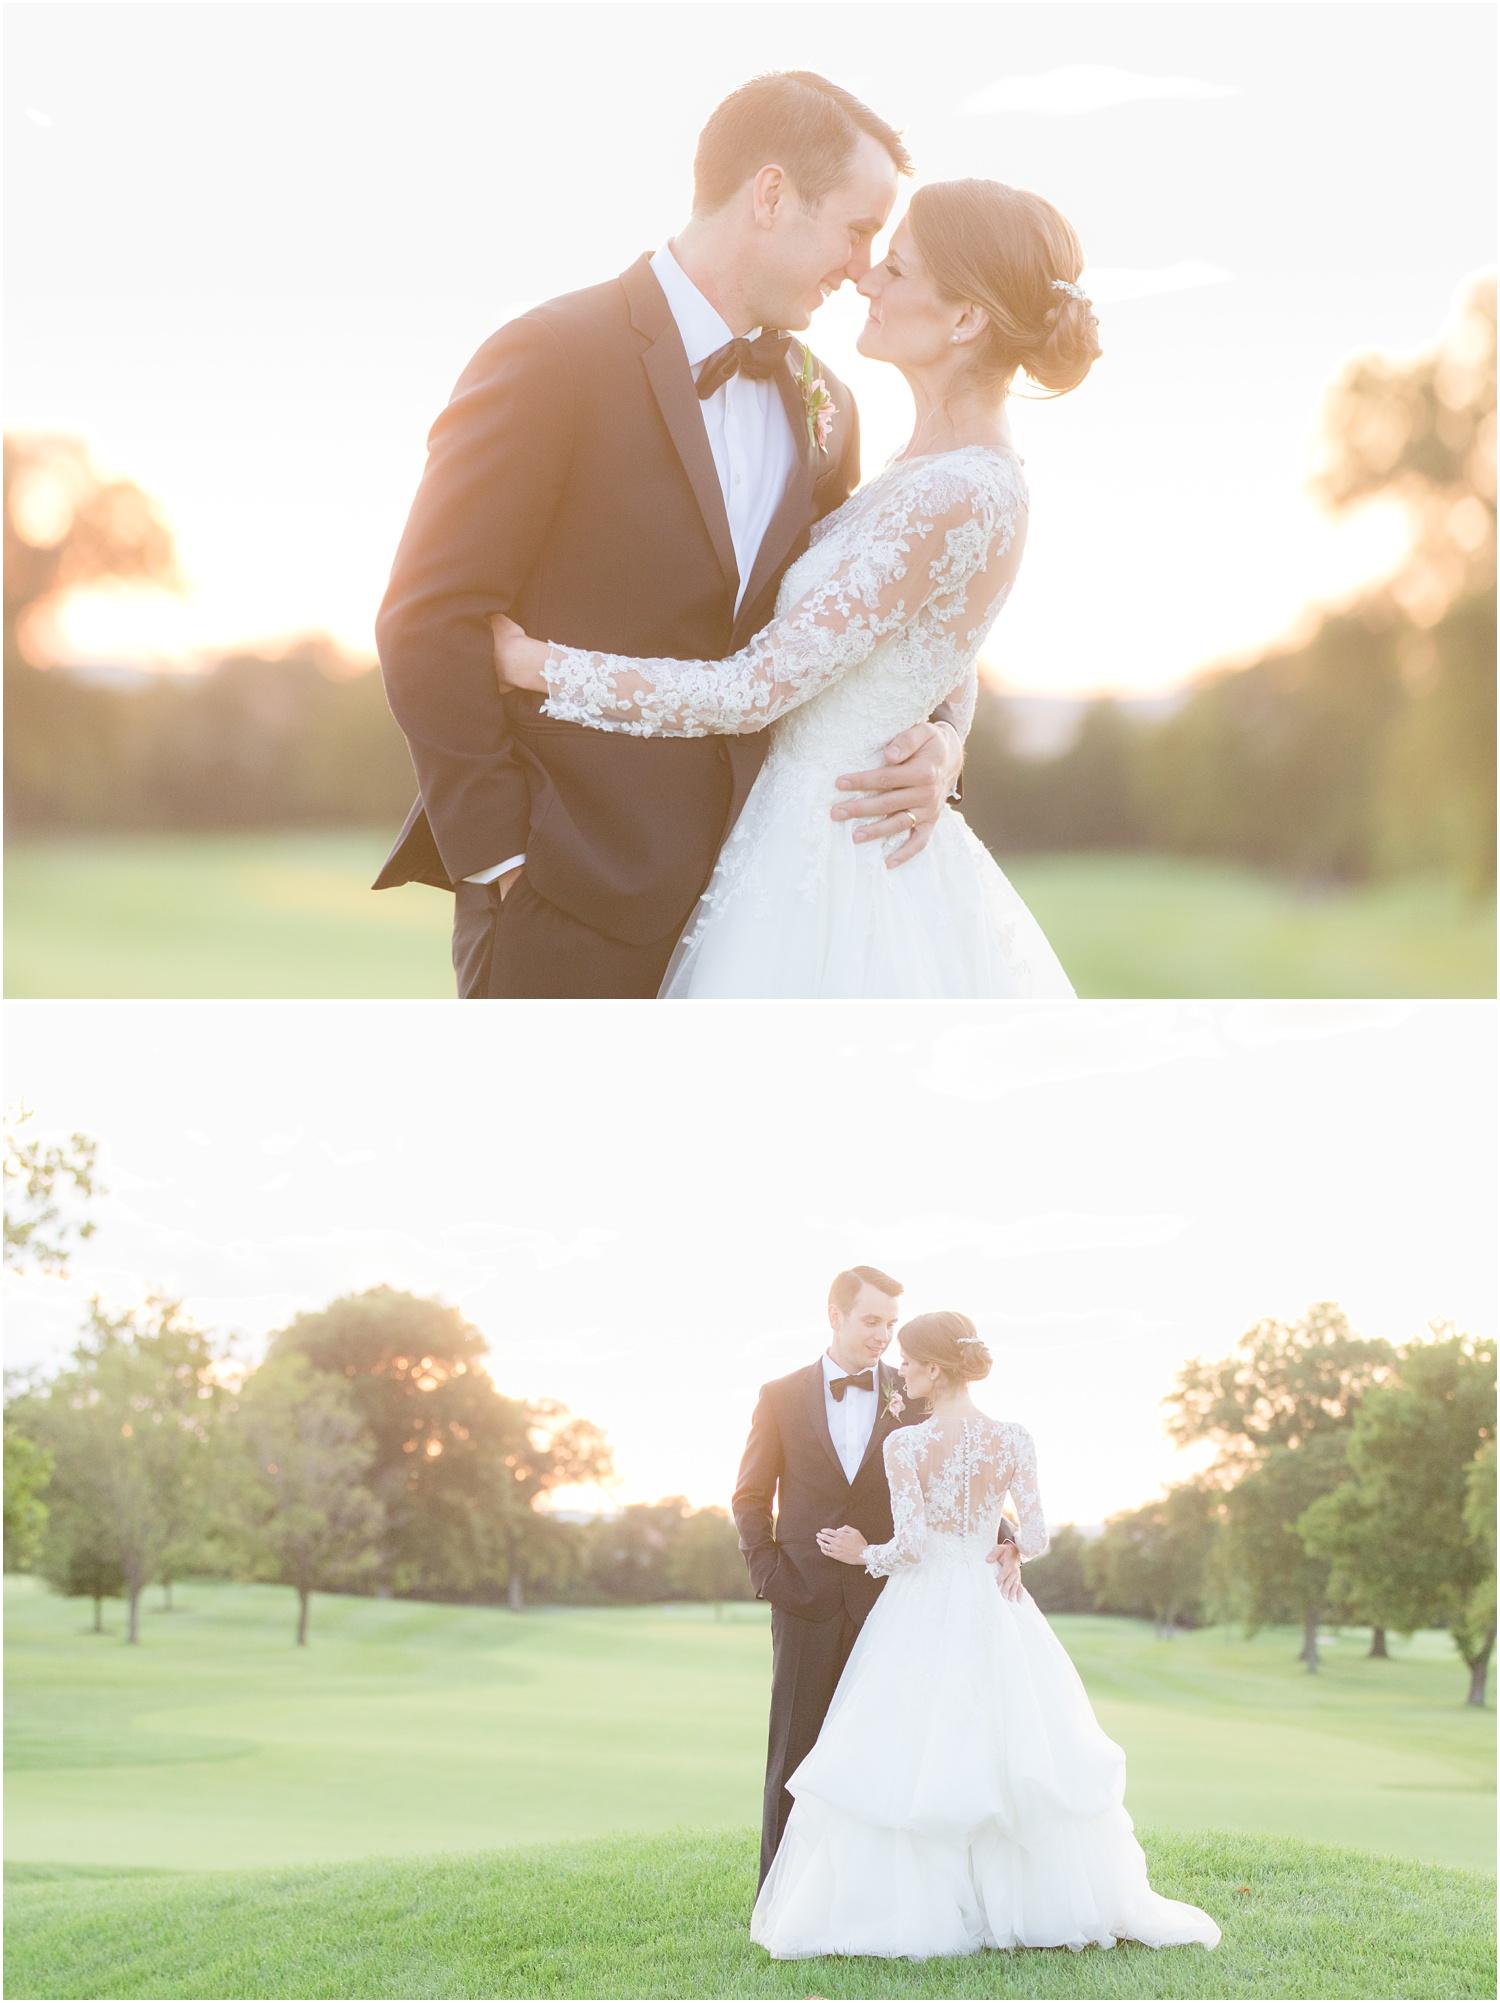 Intimate Sunset wedding photos at Canoe Brook Country Club